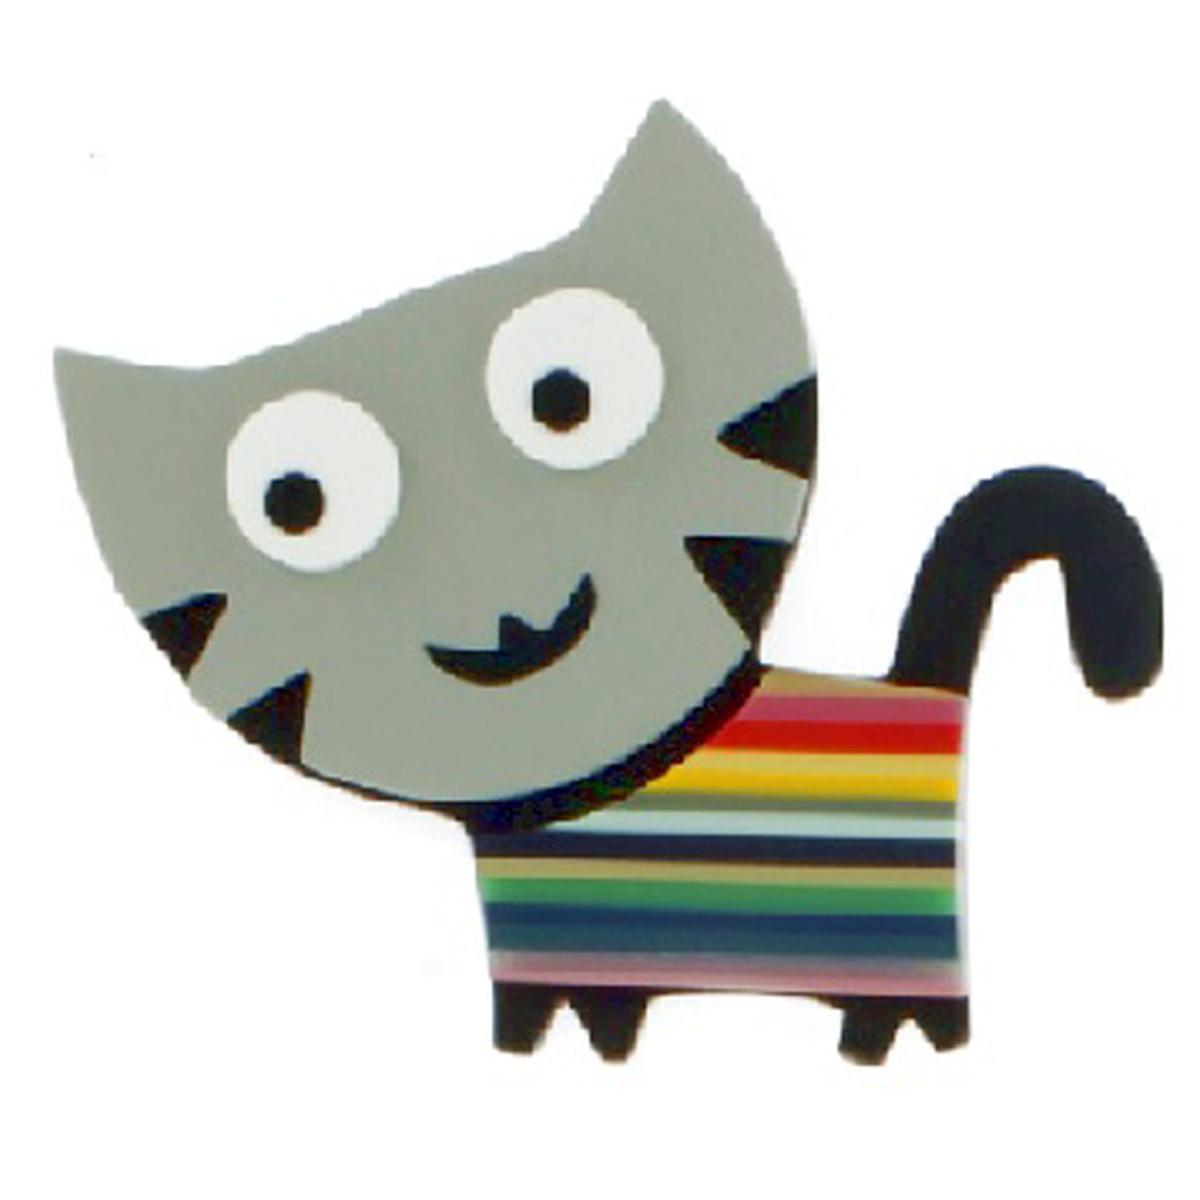 Broche artisanale \'Mistinguette\' gris multicolore (chat) - 90x75 mm - [R4260]